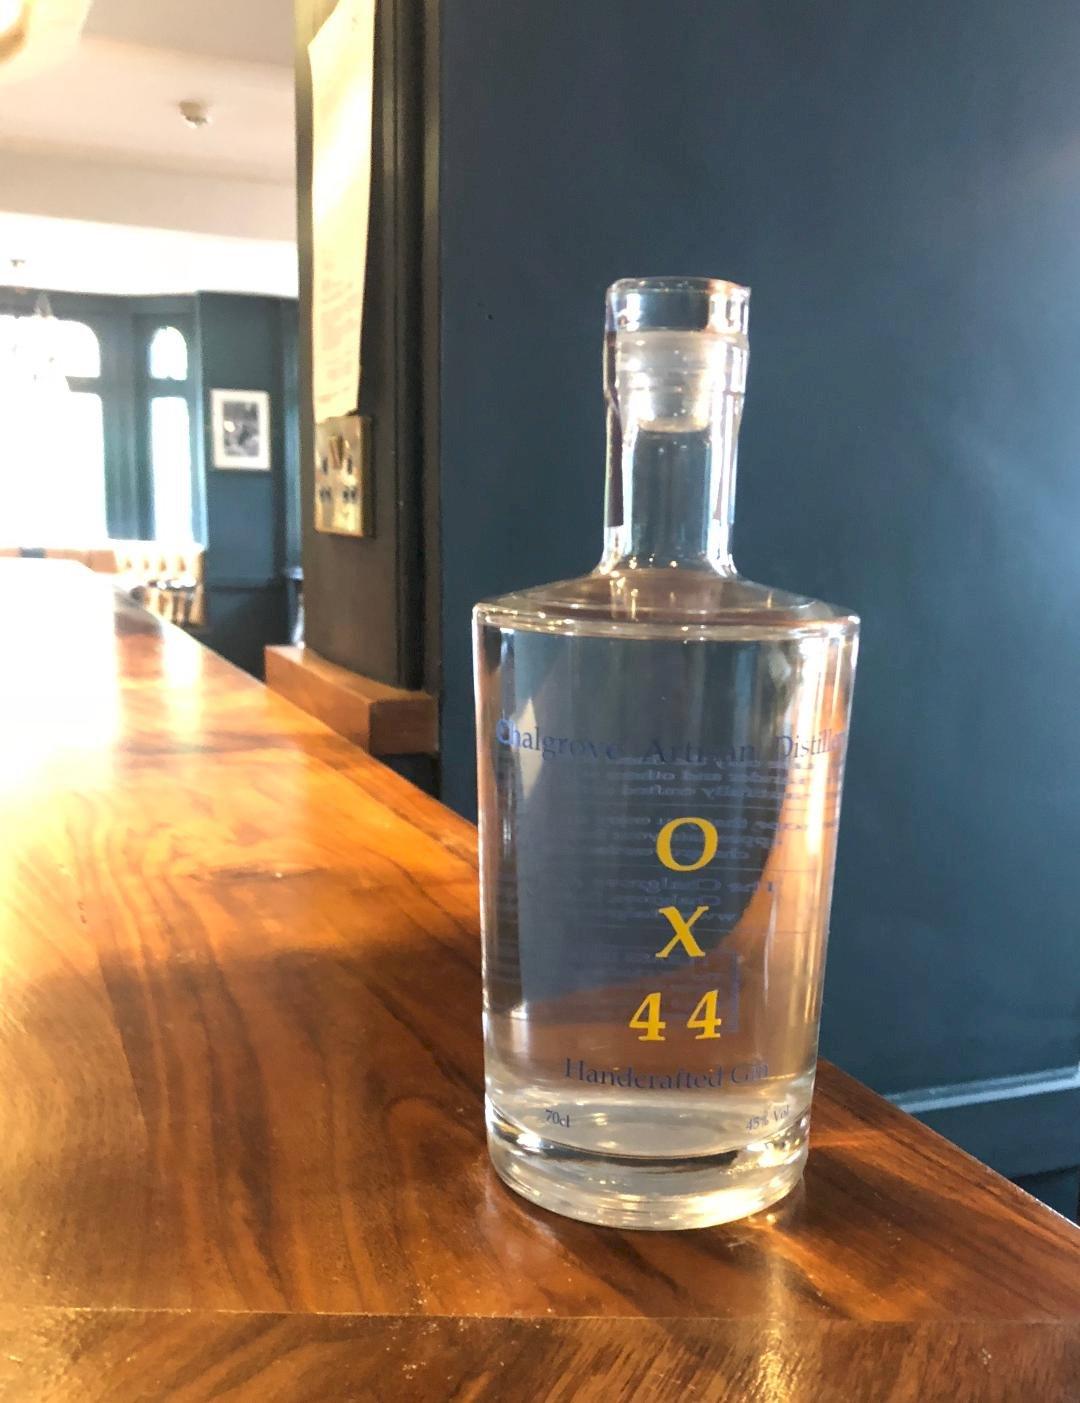 Mother's Ruin Chalgrove Artisan Distillery bottle on bar